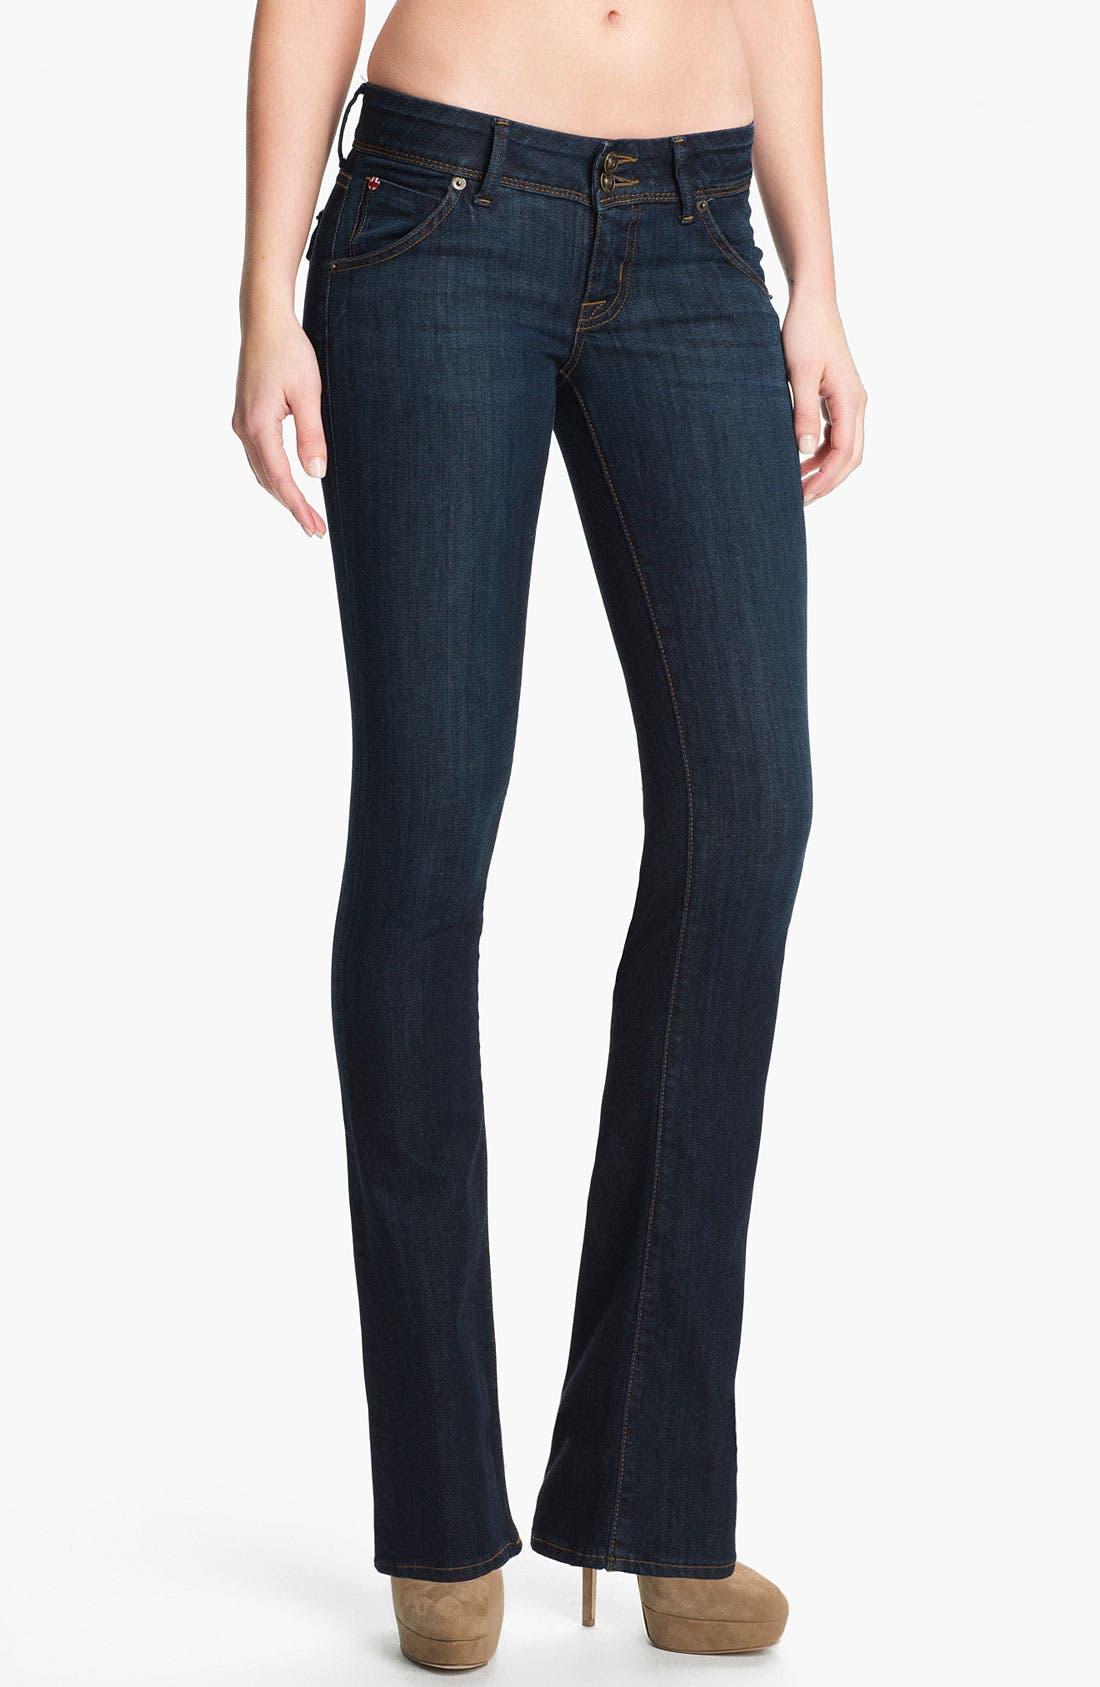 Main Image - Hudson Jeans 'Beth' Baby Bootcut Jeans (Rhea)